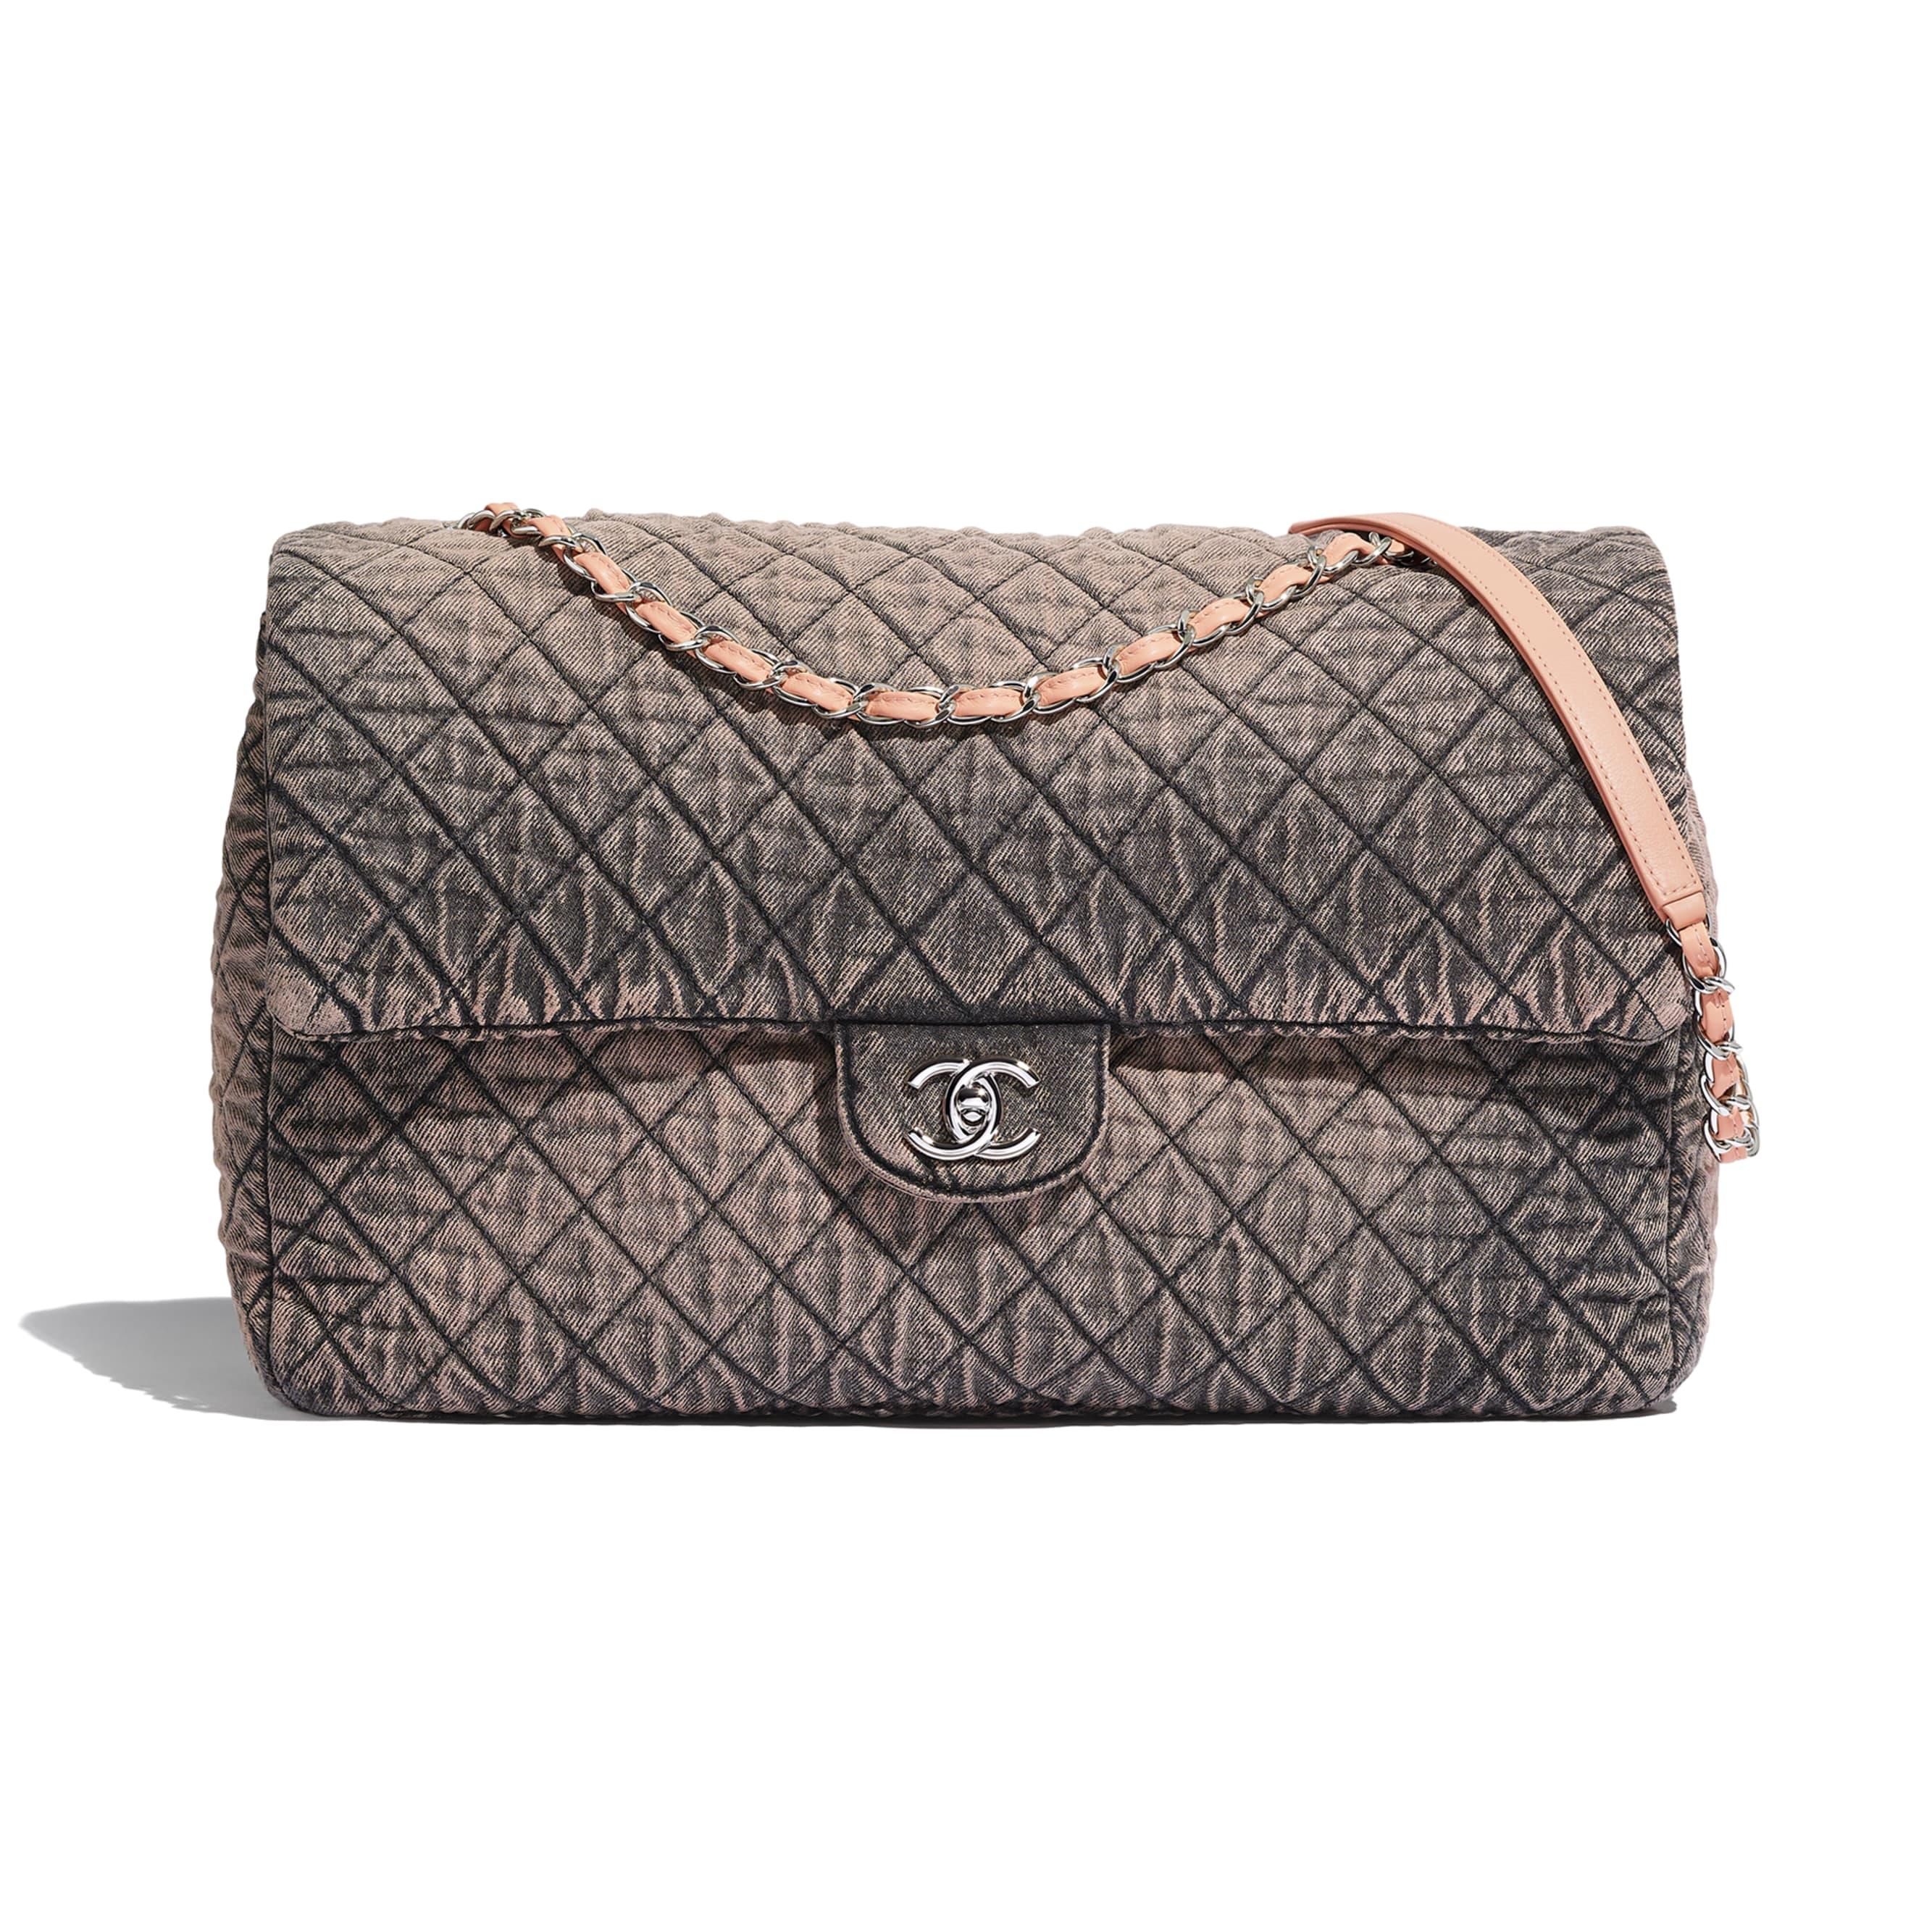 Large Flap Bag - Light Pink & Black - Denim & Silver-Tone Metal - Default view - see standard sized version